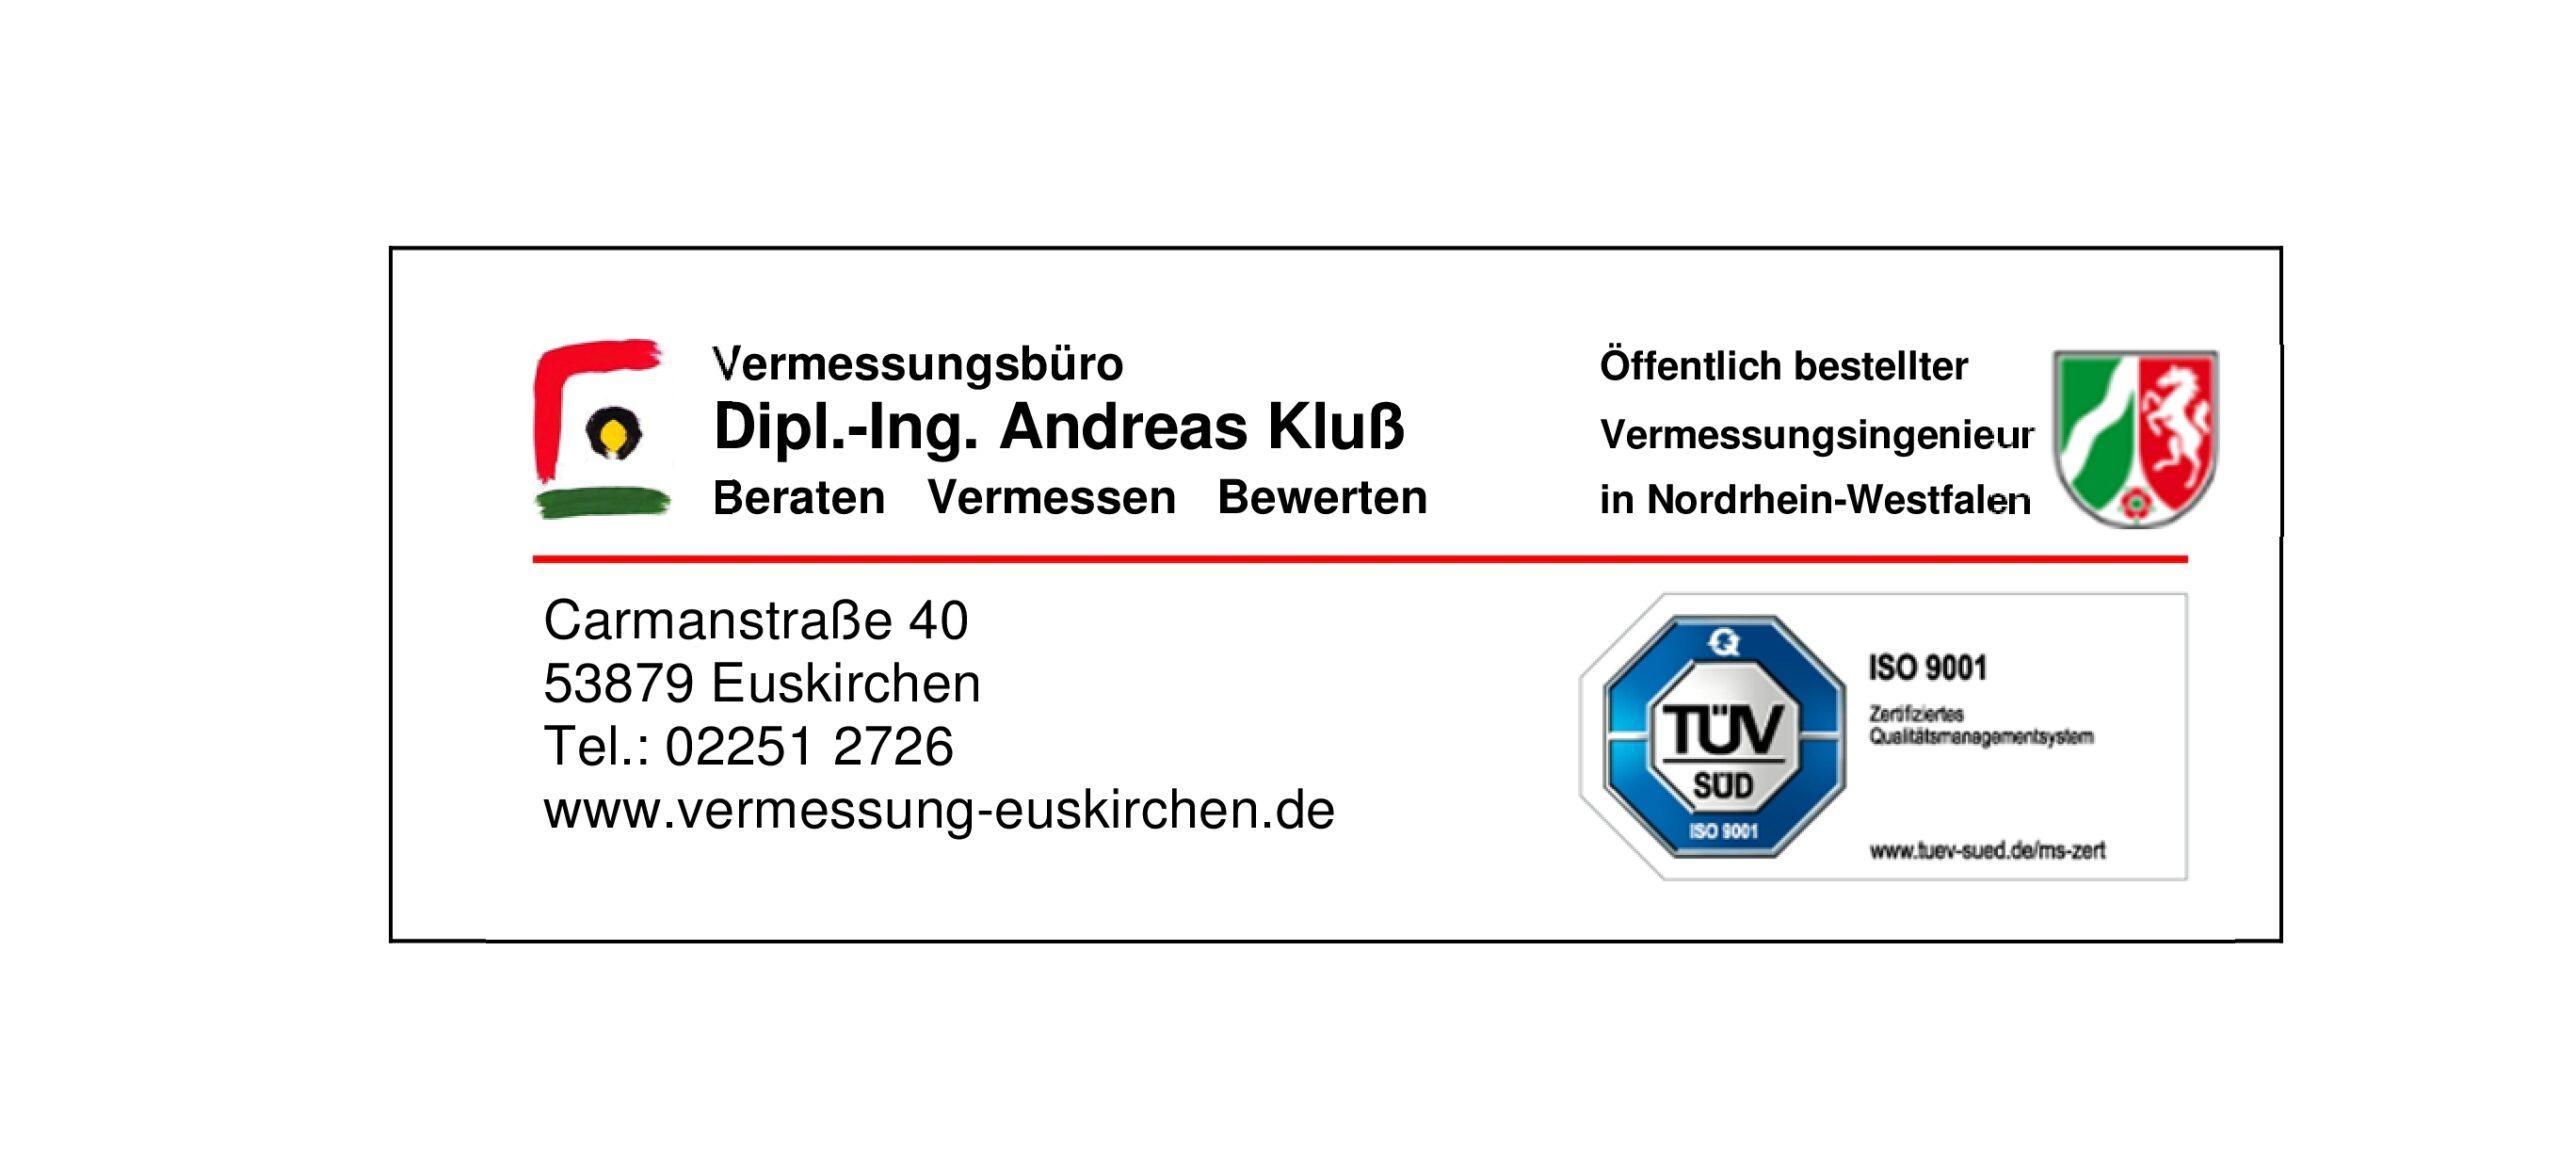 Vermessungsbüro Andreas Kluß